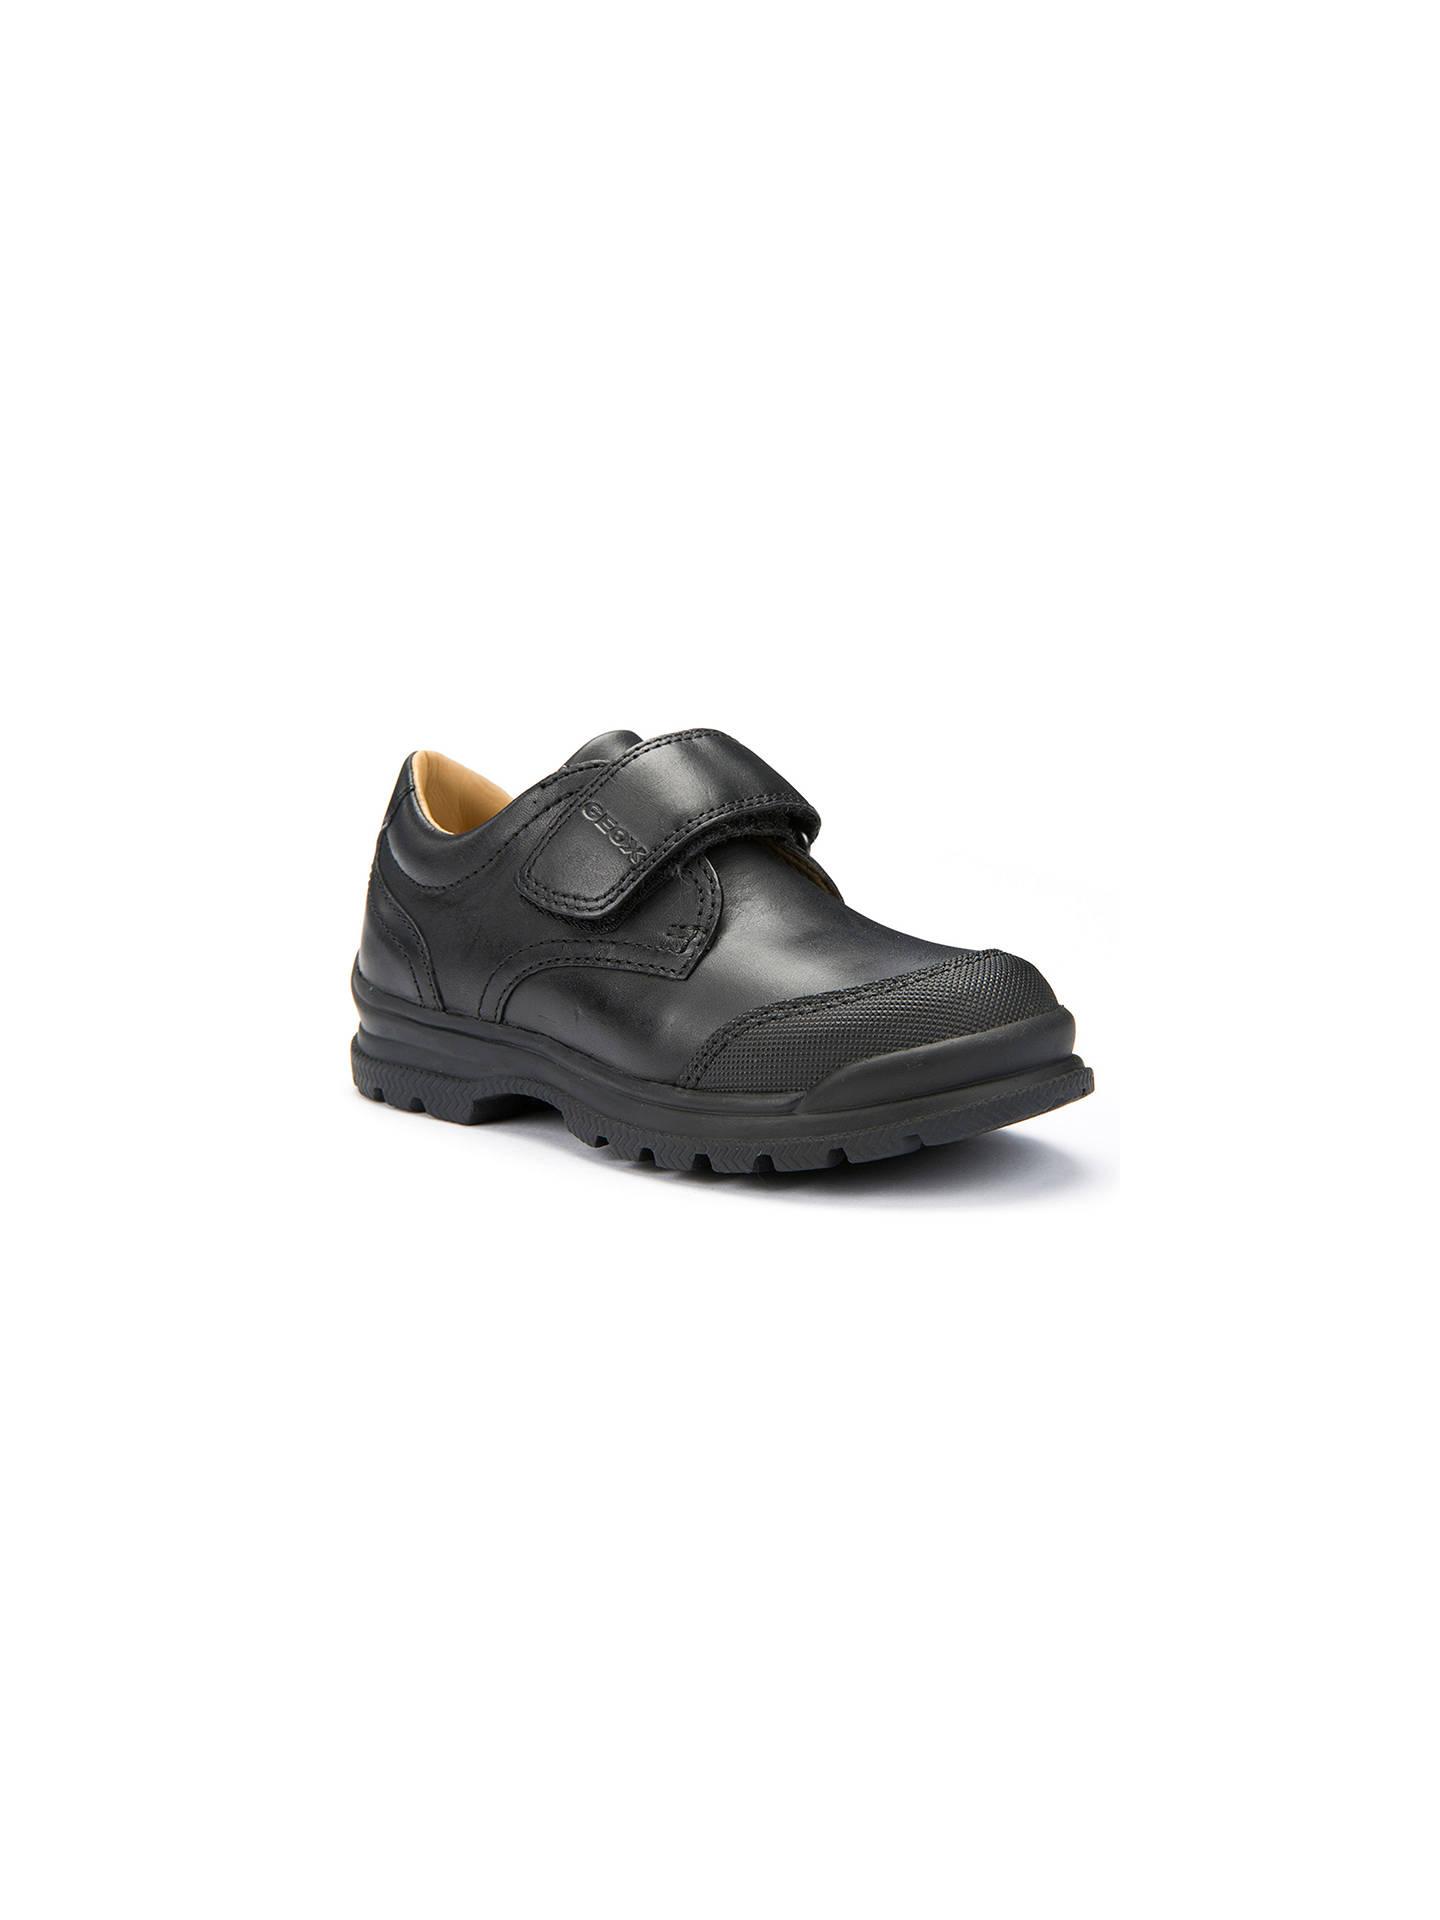 bofetada esperanza Gruñido  Geox Children's William School Shoes, Black at John Lewis & Partners